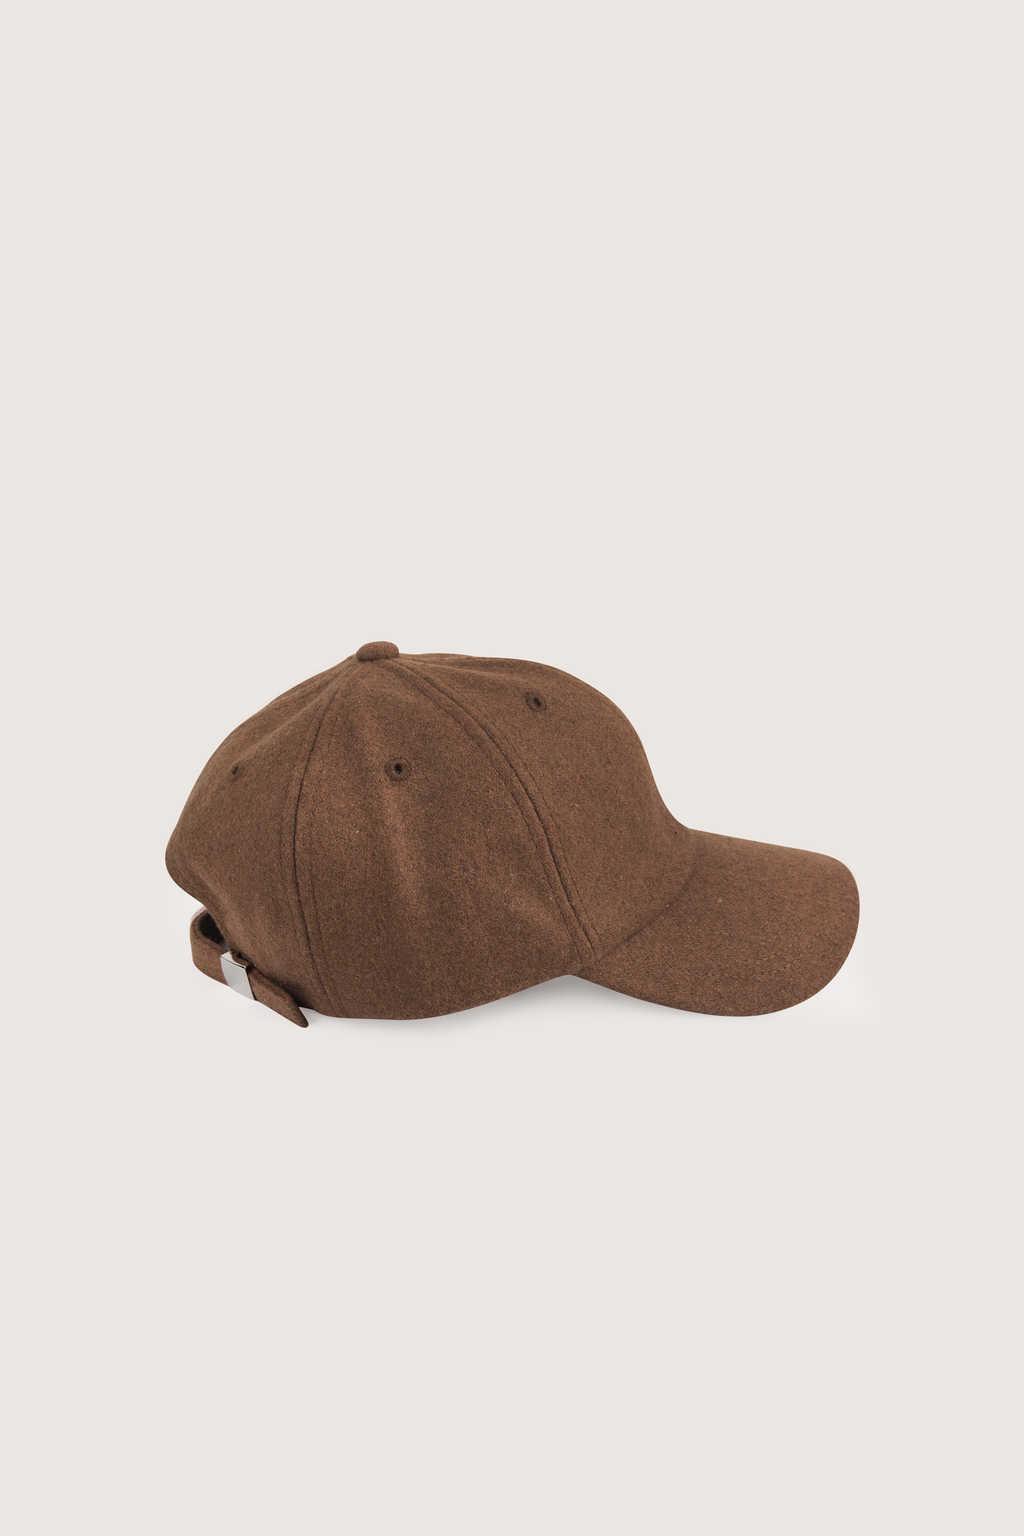 Hat H017 Brown 3